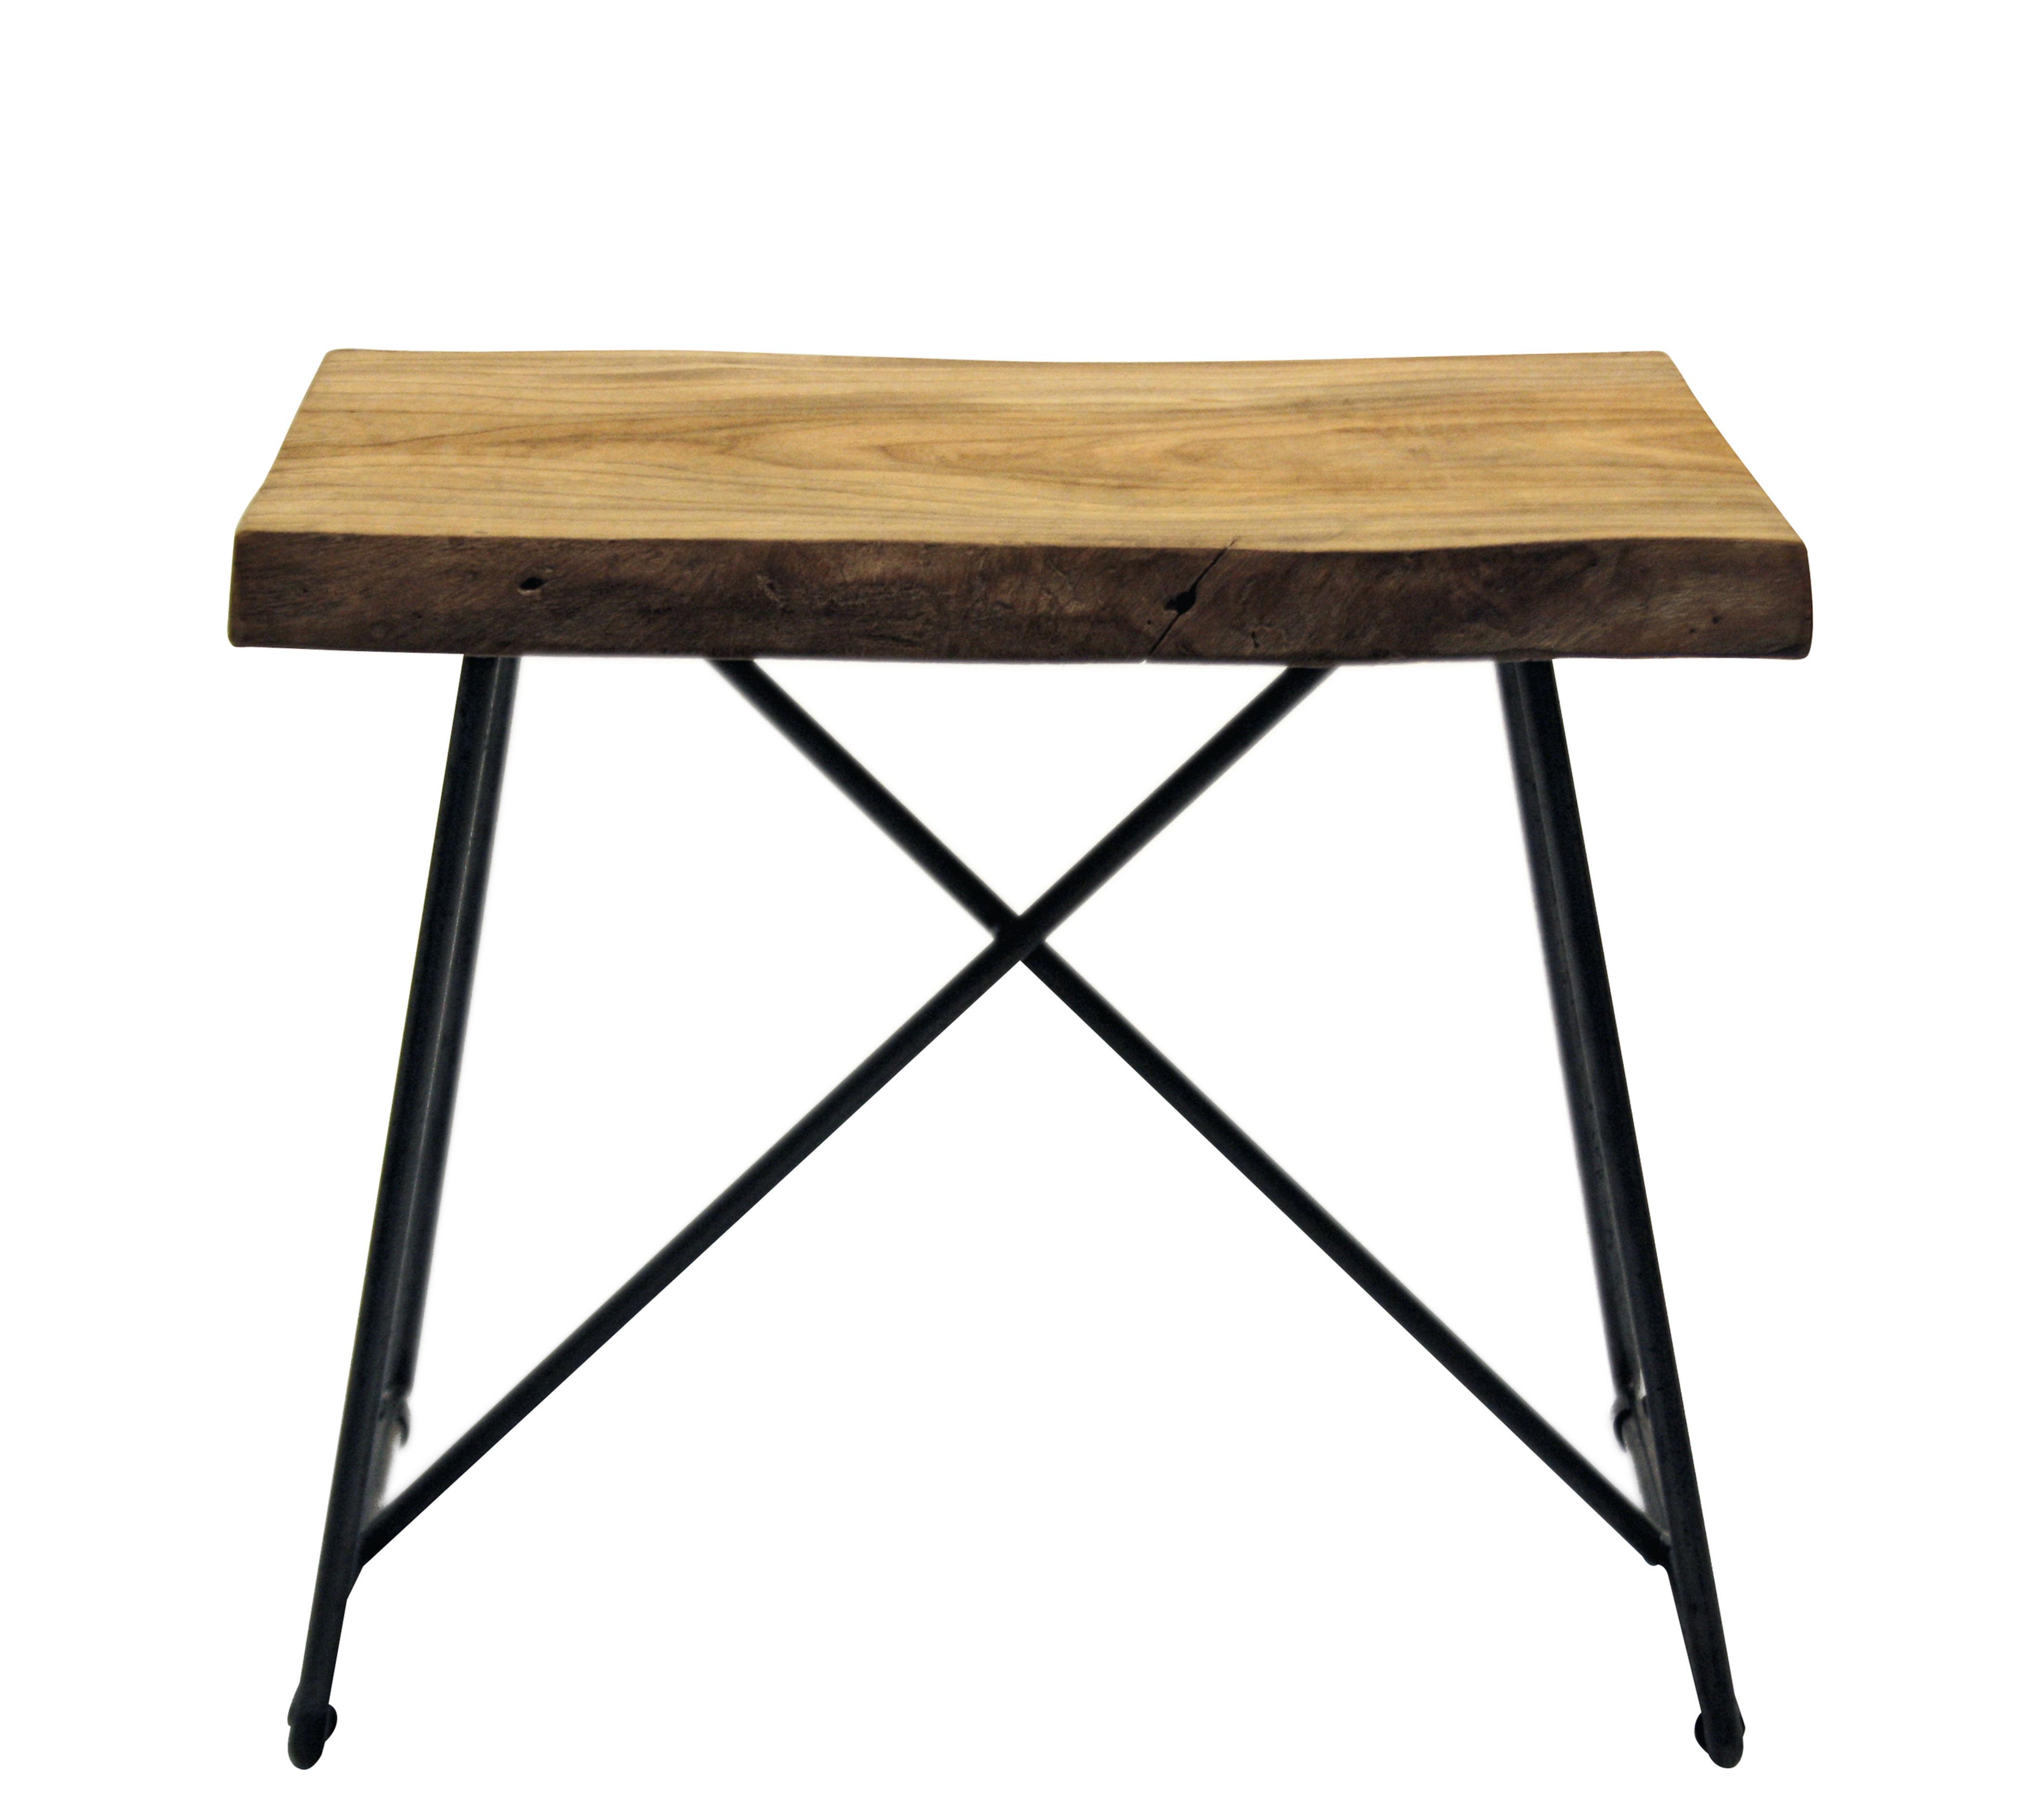 Möbel - Hocker - Old Times Hocker / H 47 cm - Zeus - Holz natur / Fußgestell schwarz - bemalter Stahl, Olivier massif